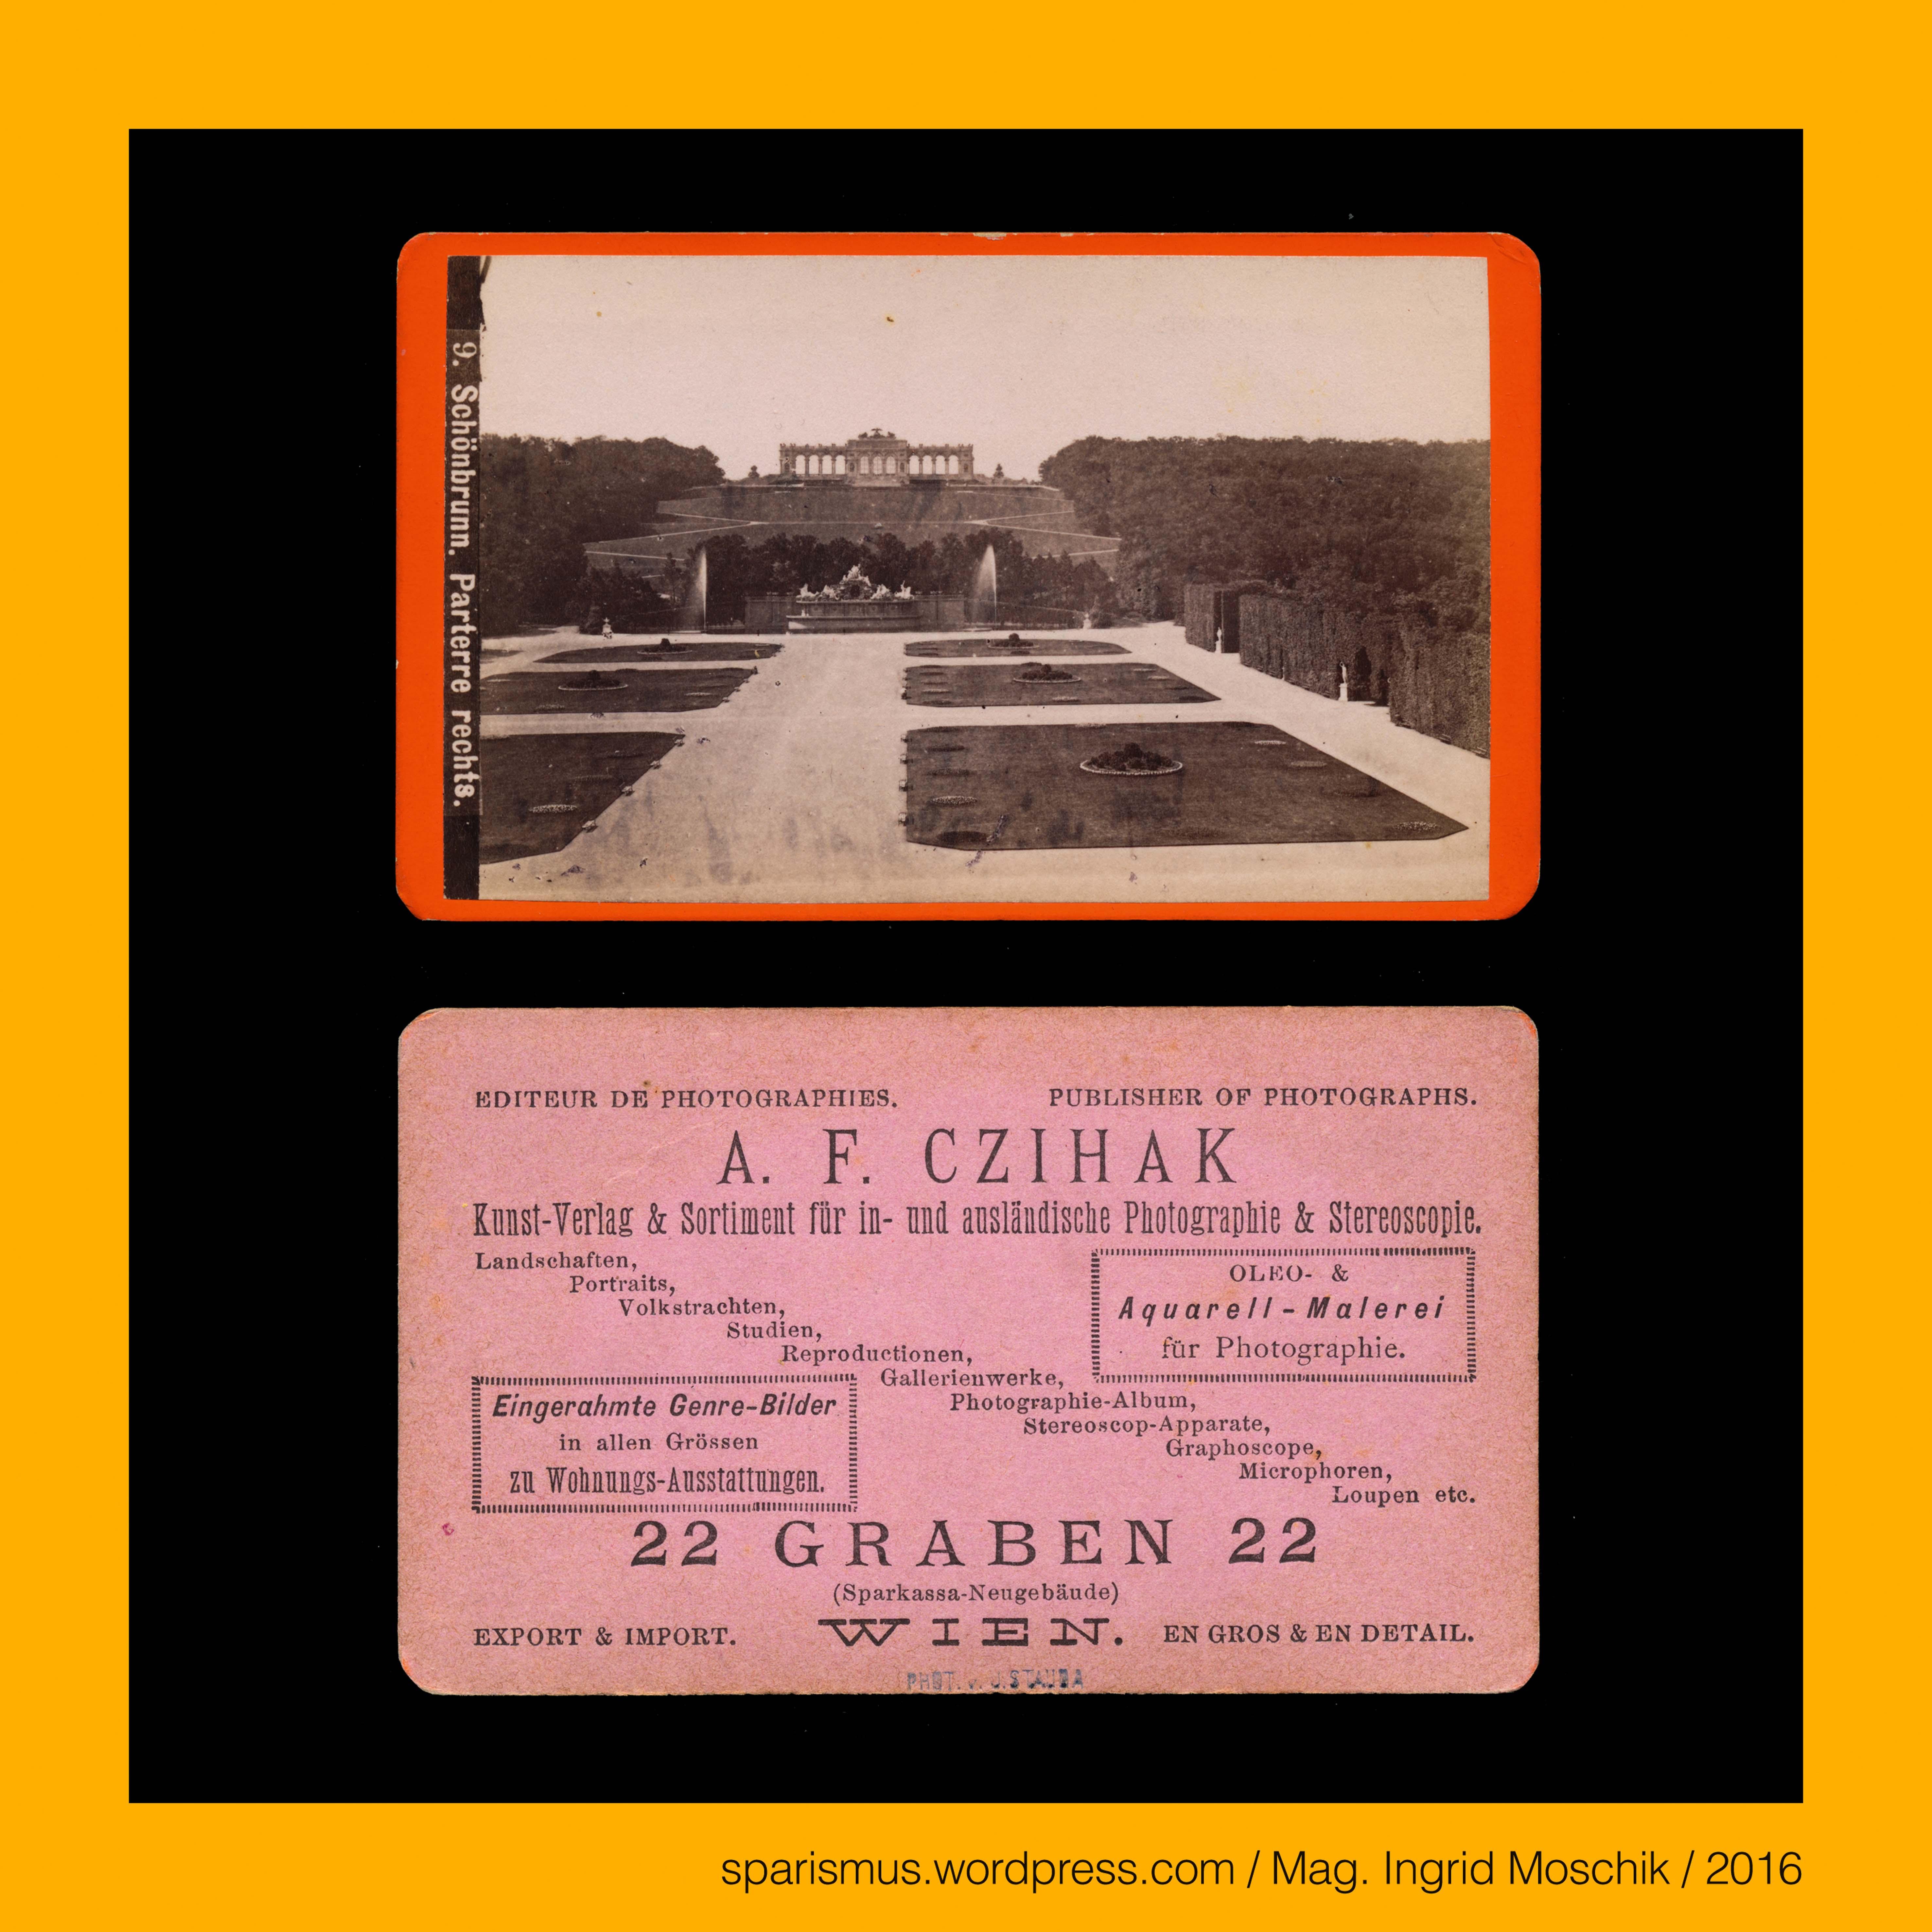 J. Stauda, Fotograf, A. F. Czihak, Kunstverlag, #Wien, #9 ...